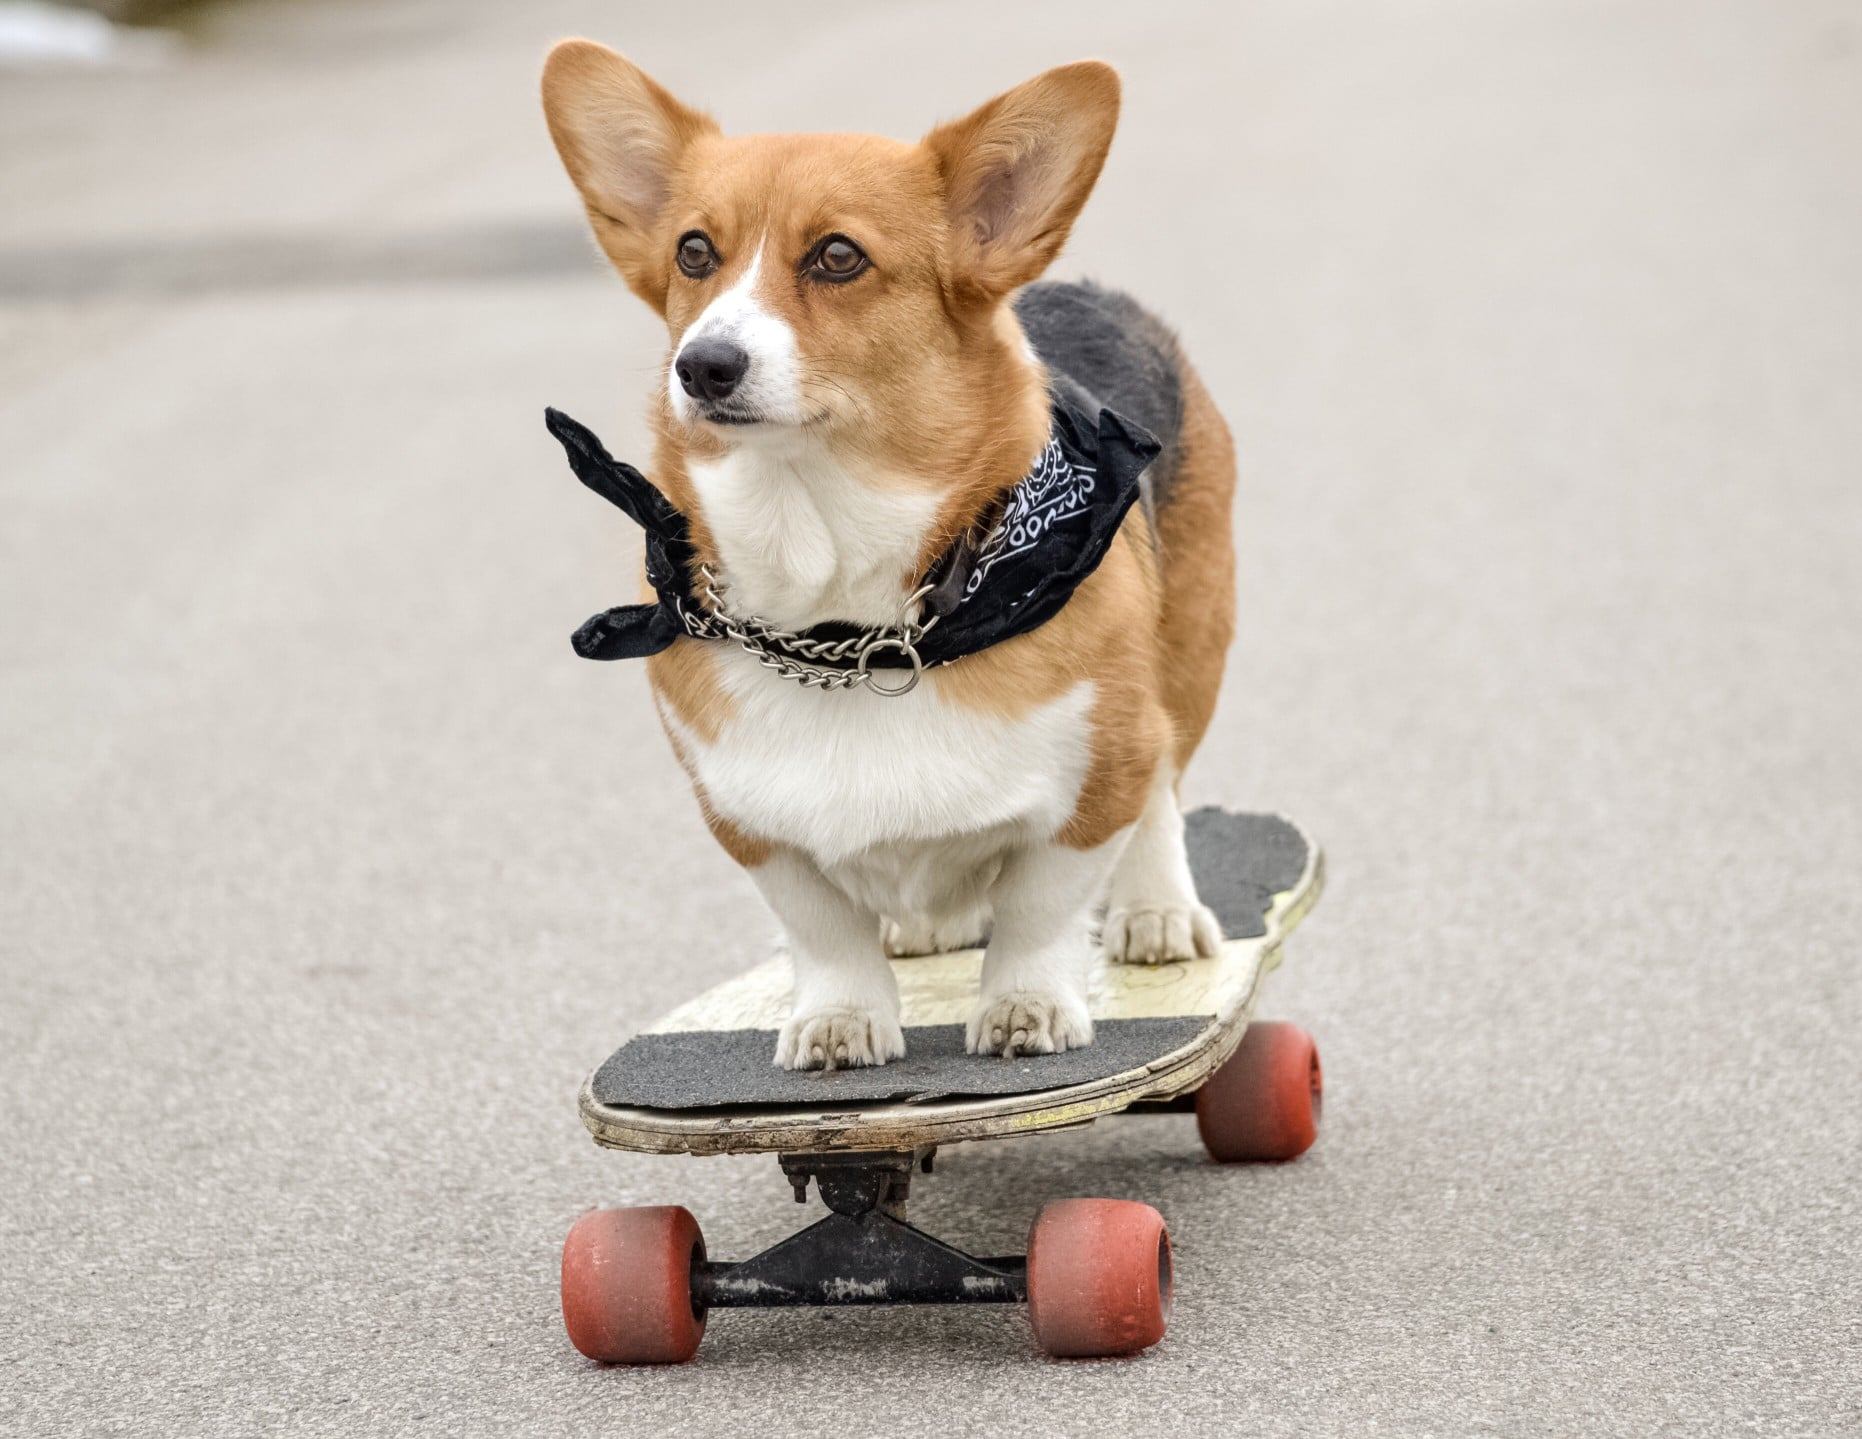 A dog riding a skateboard